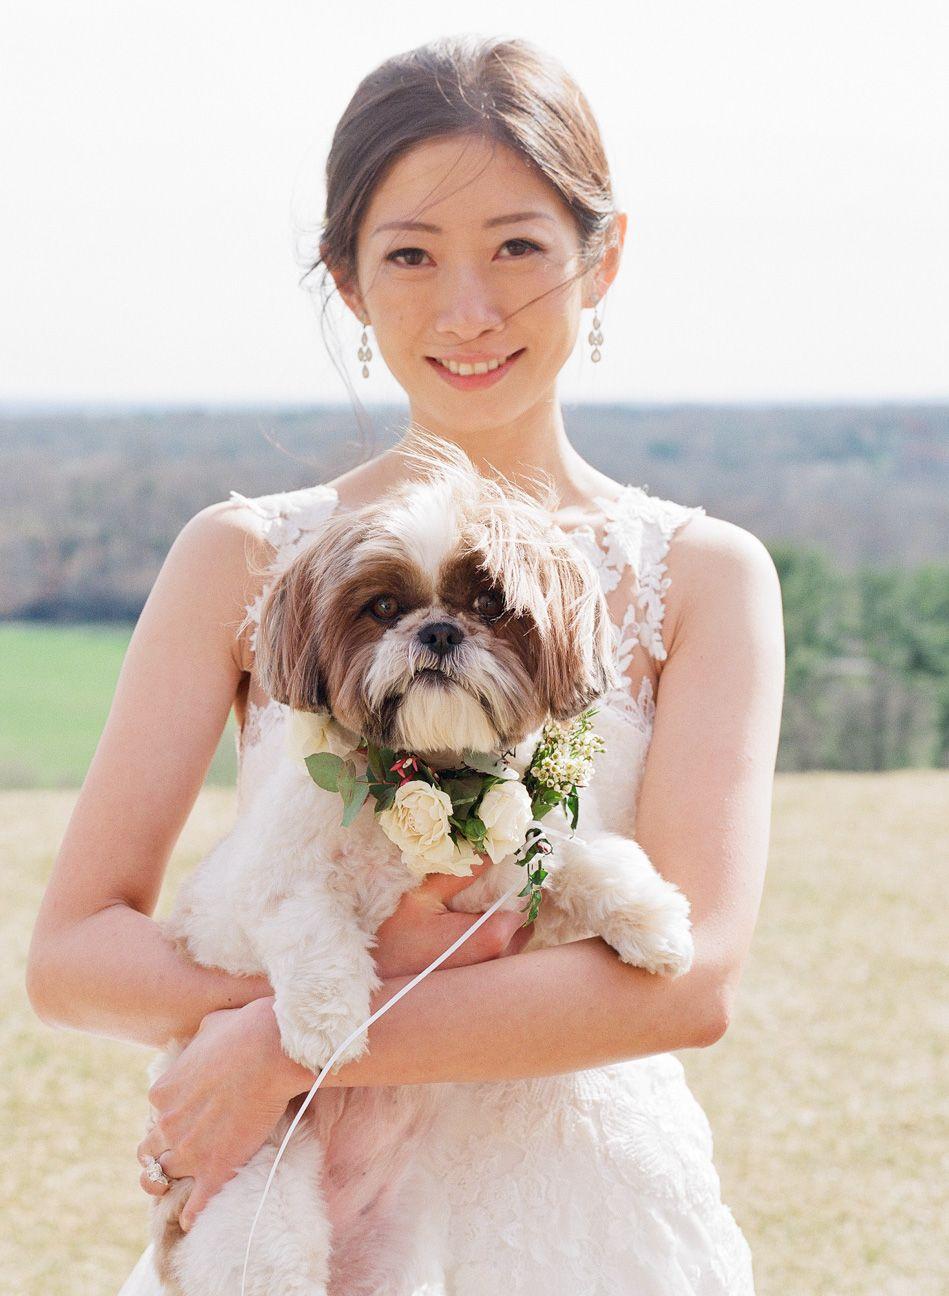 KarenHillPhotography-Zhu-Wedding-0305.jpg